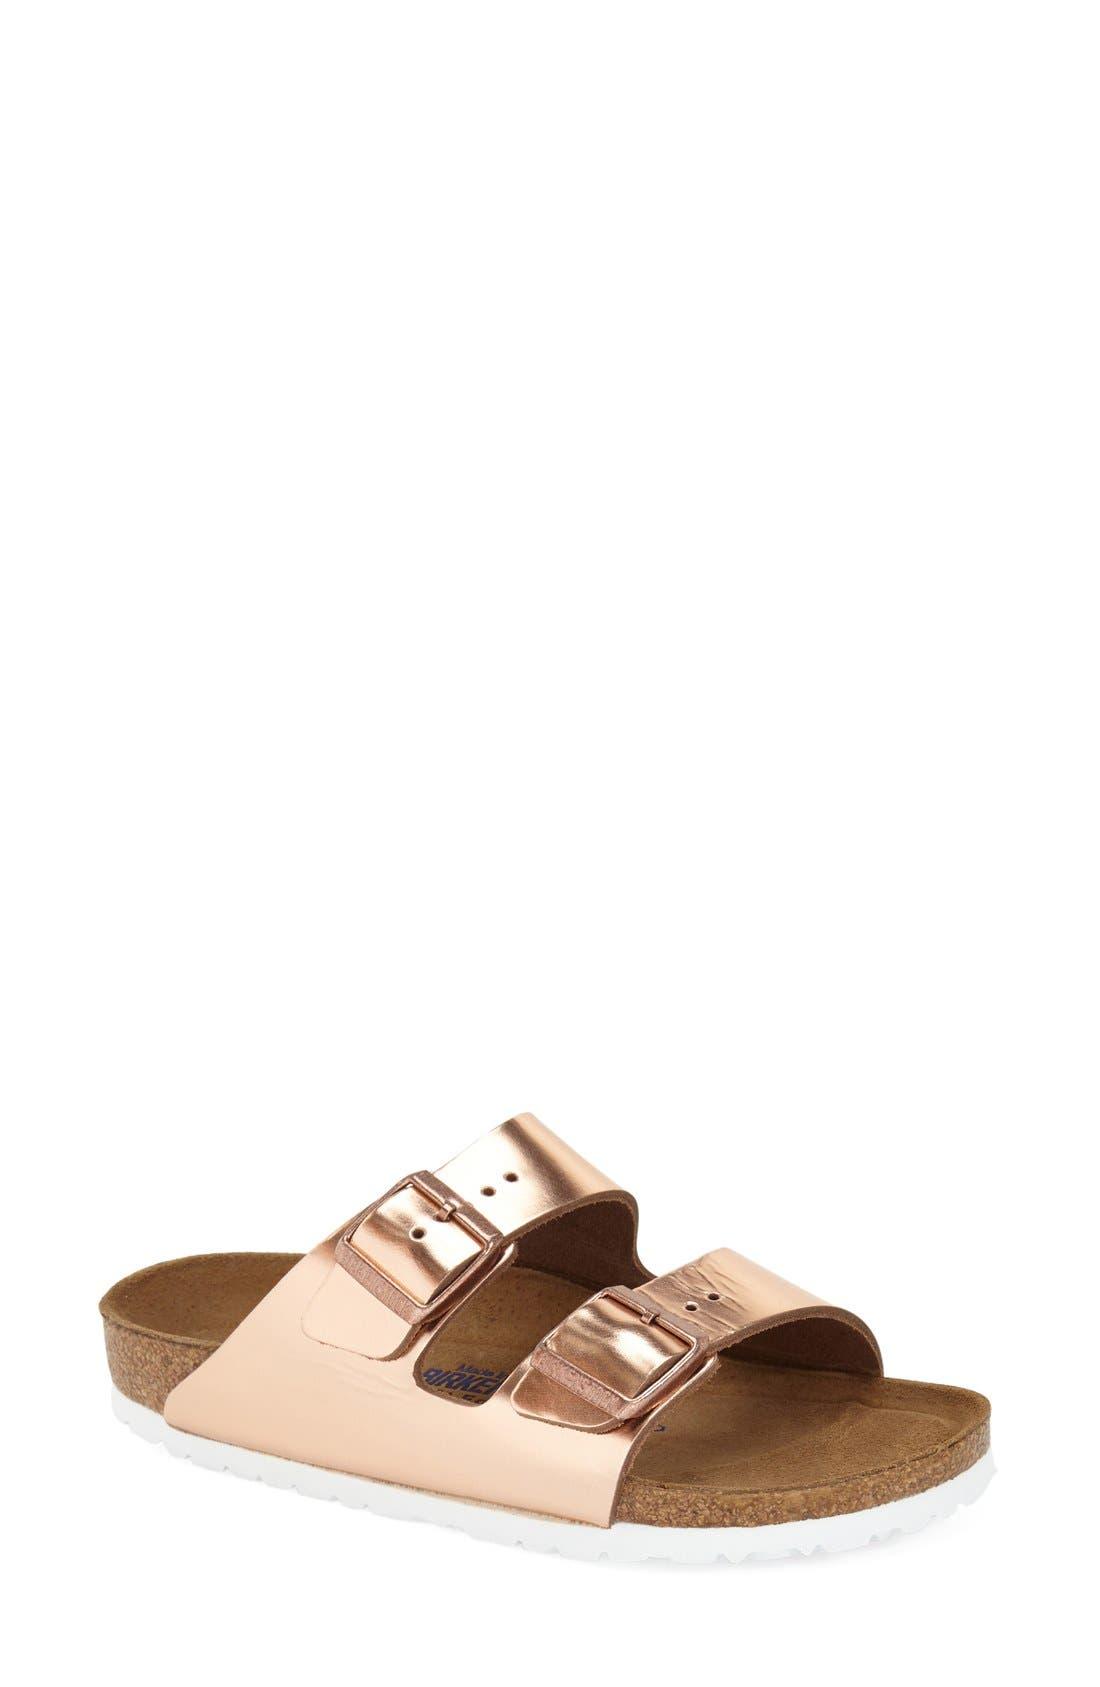 Main Image - Birkenstock 'Arizona' Patent Leather Sandal (Women)